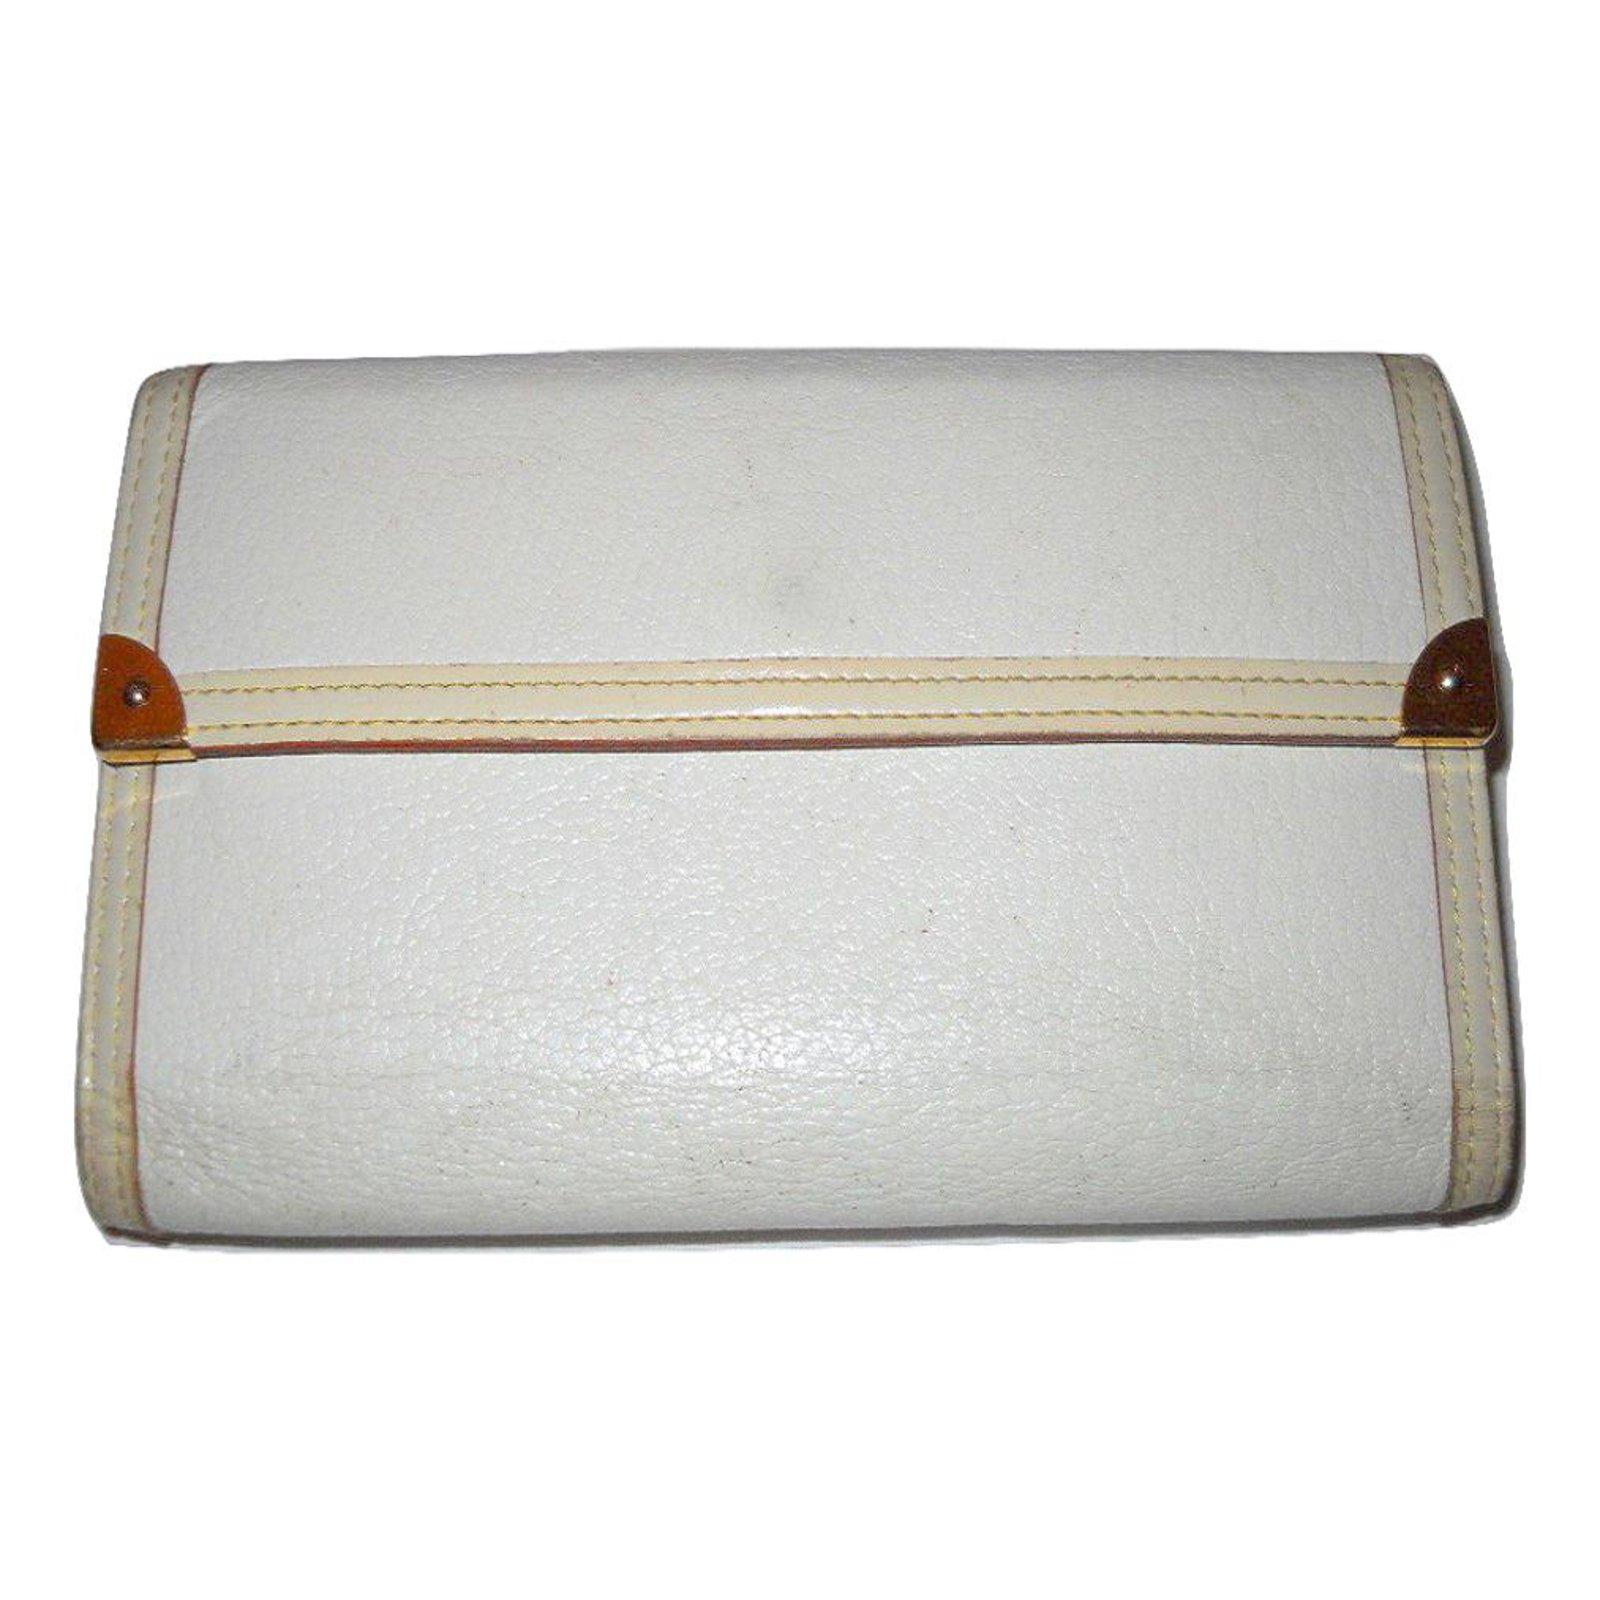 Louis Vuitton Wallet Wallets Leather White Ref 27665